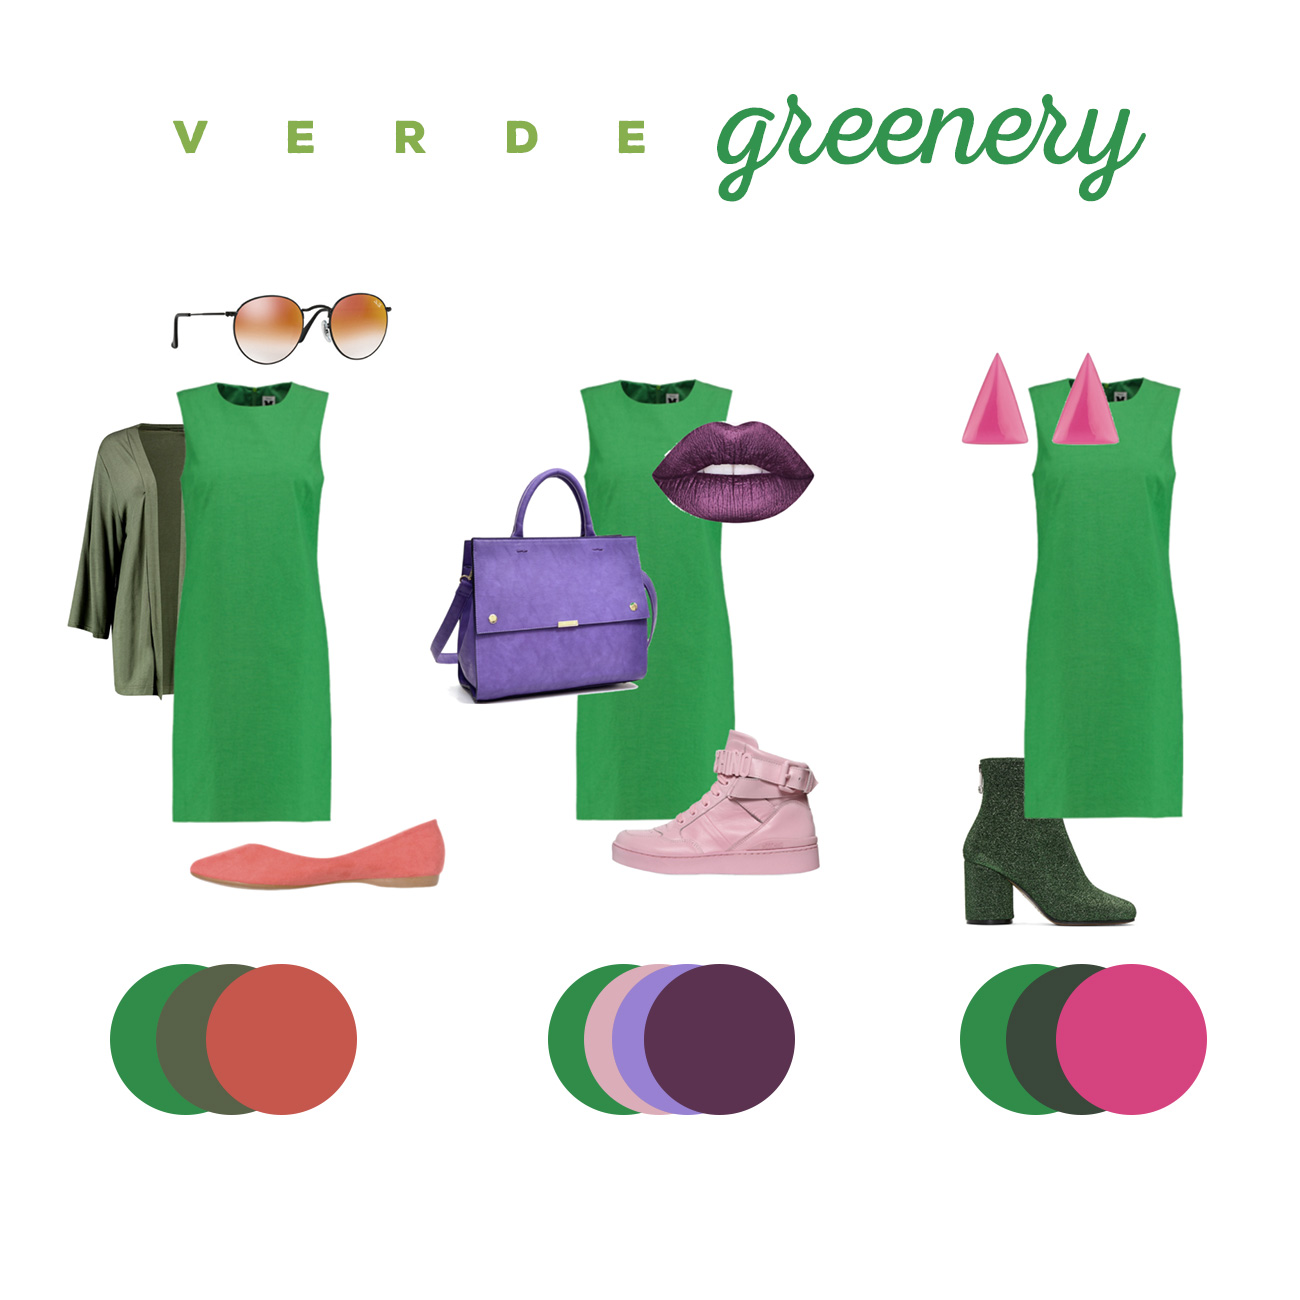 combinacao-cores-pantone-2017-verde-greengery